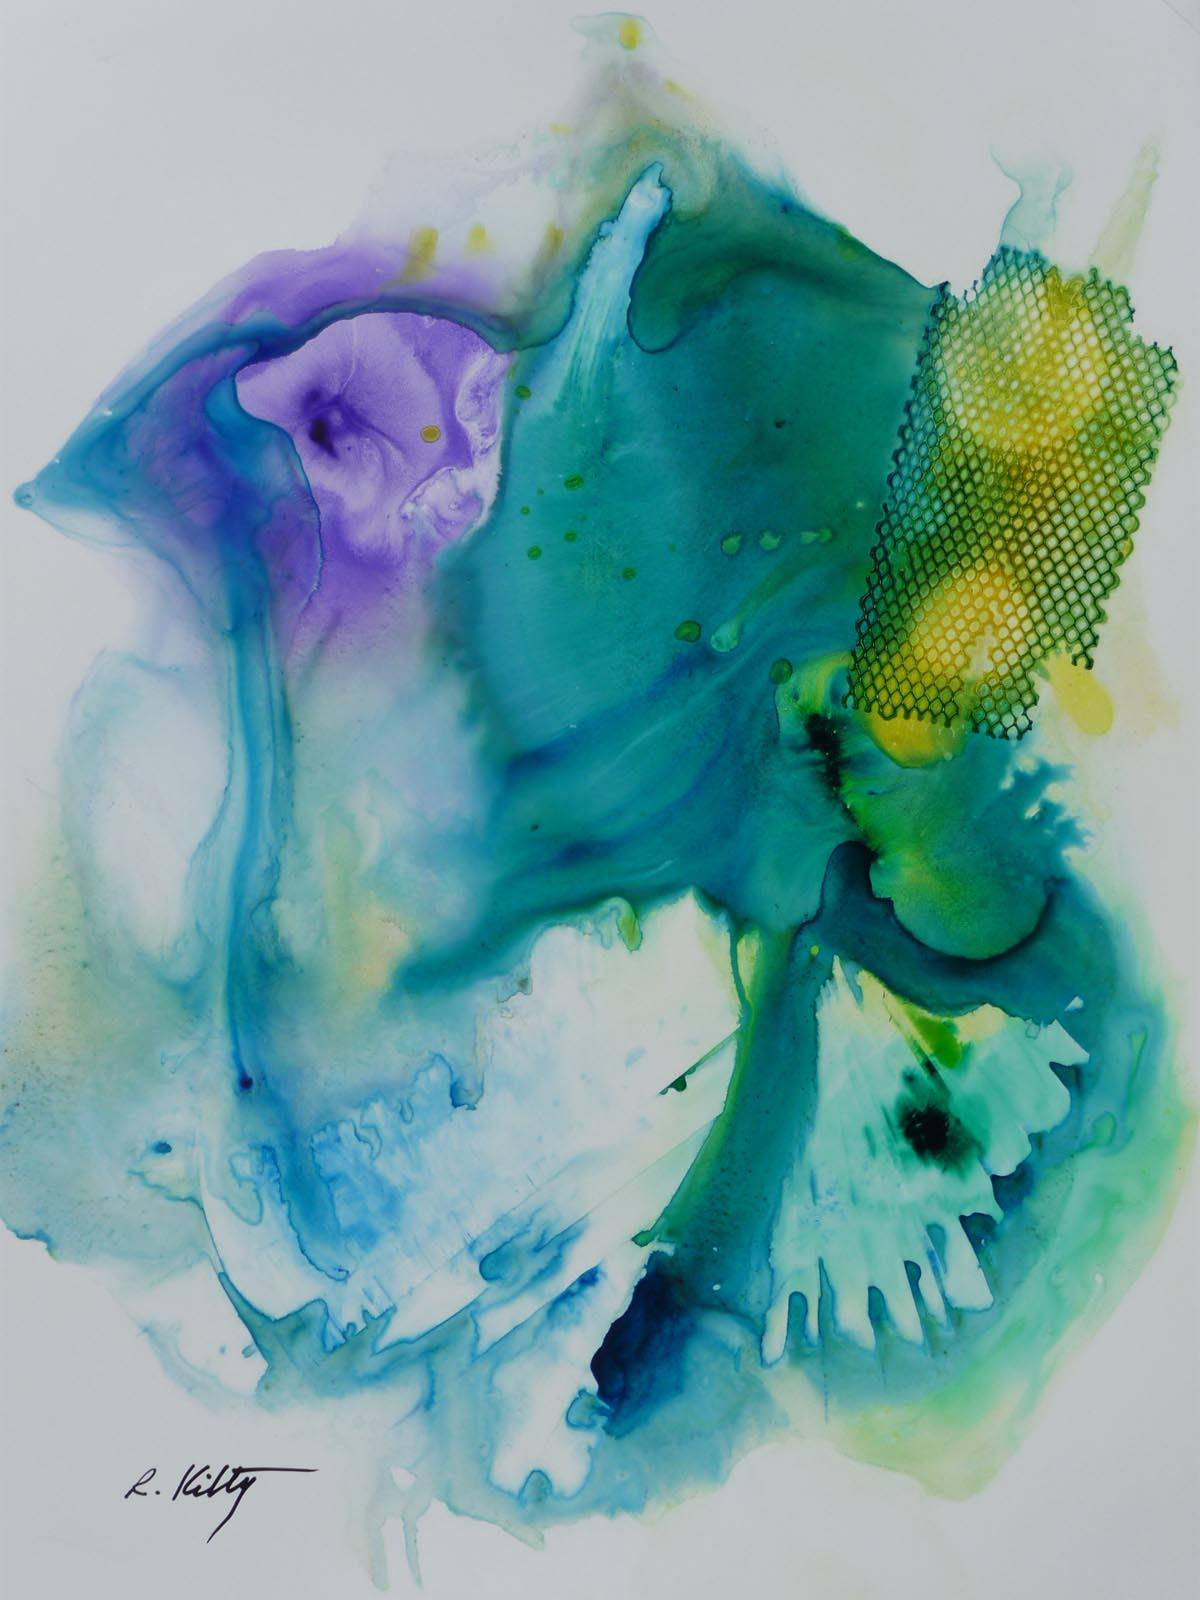 Untitled | Bobbi Kilty | Fine Artist